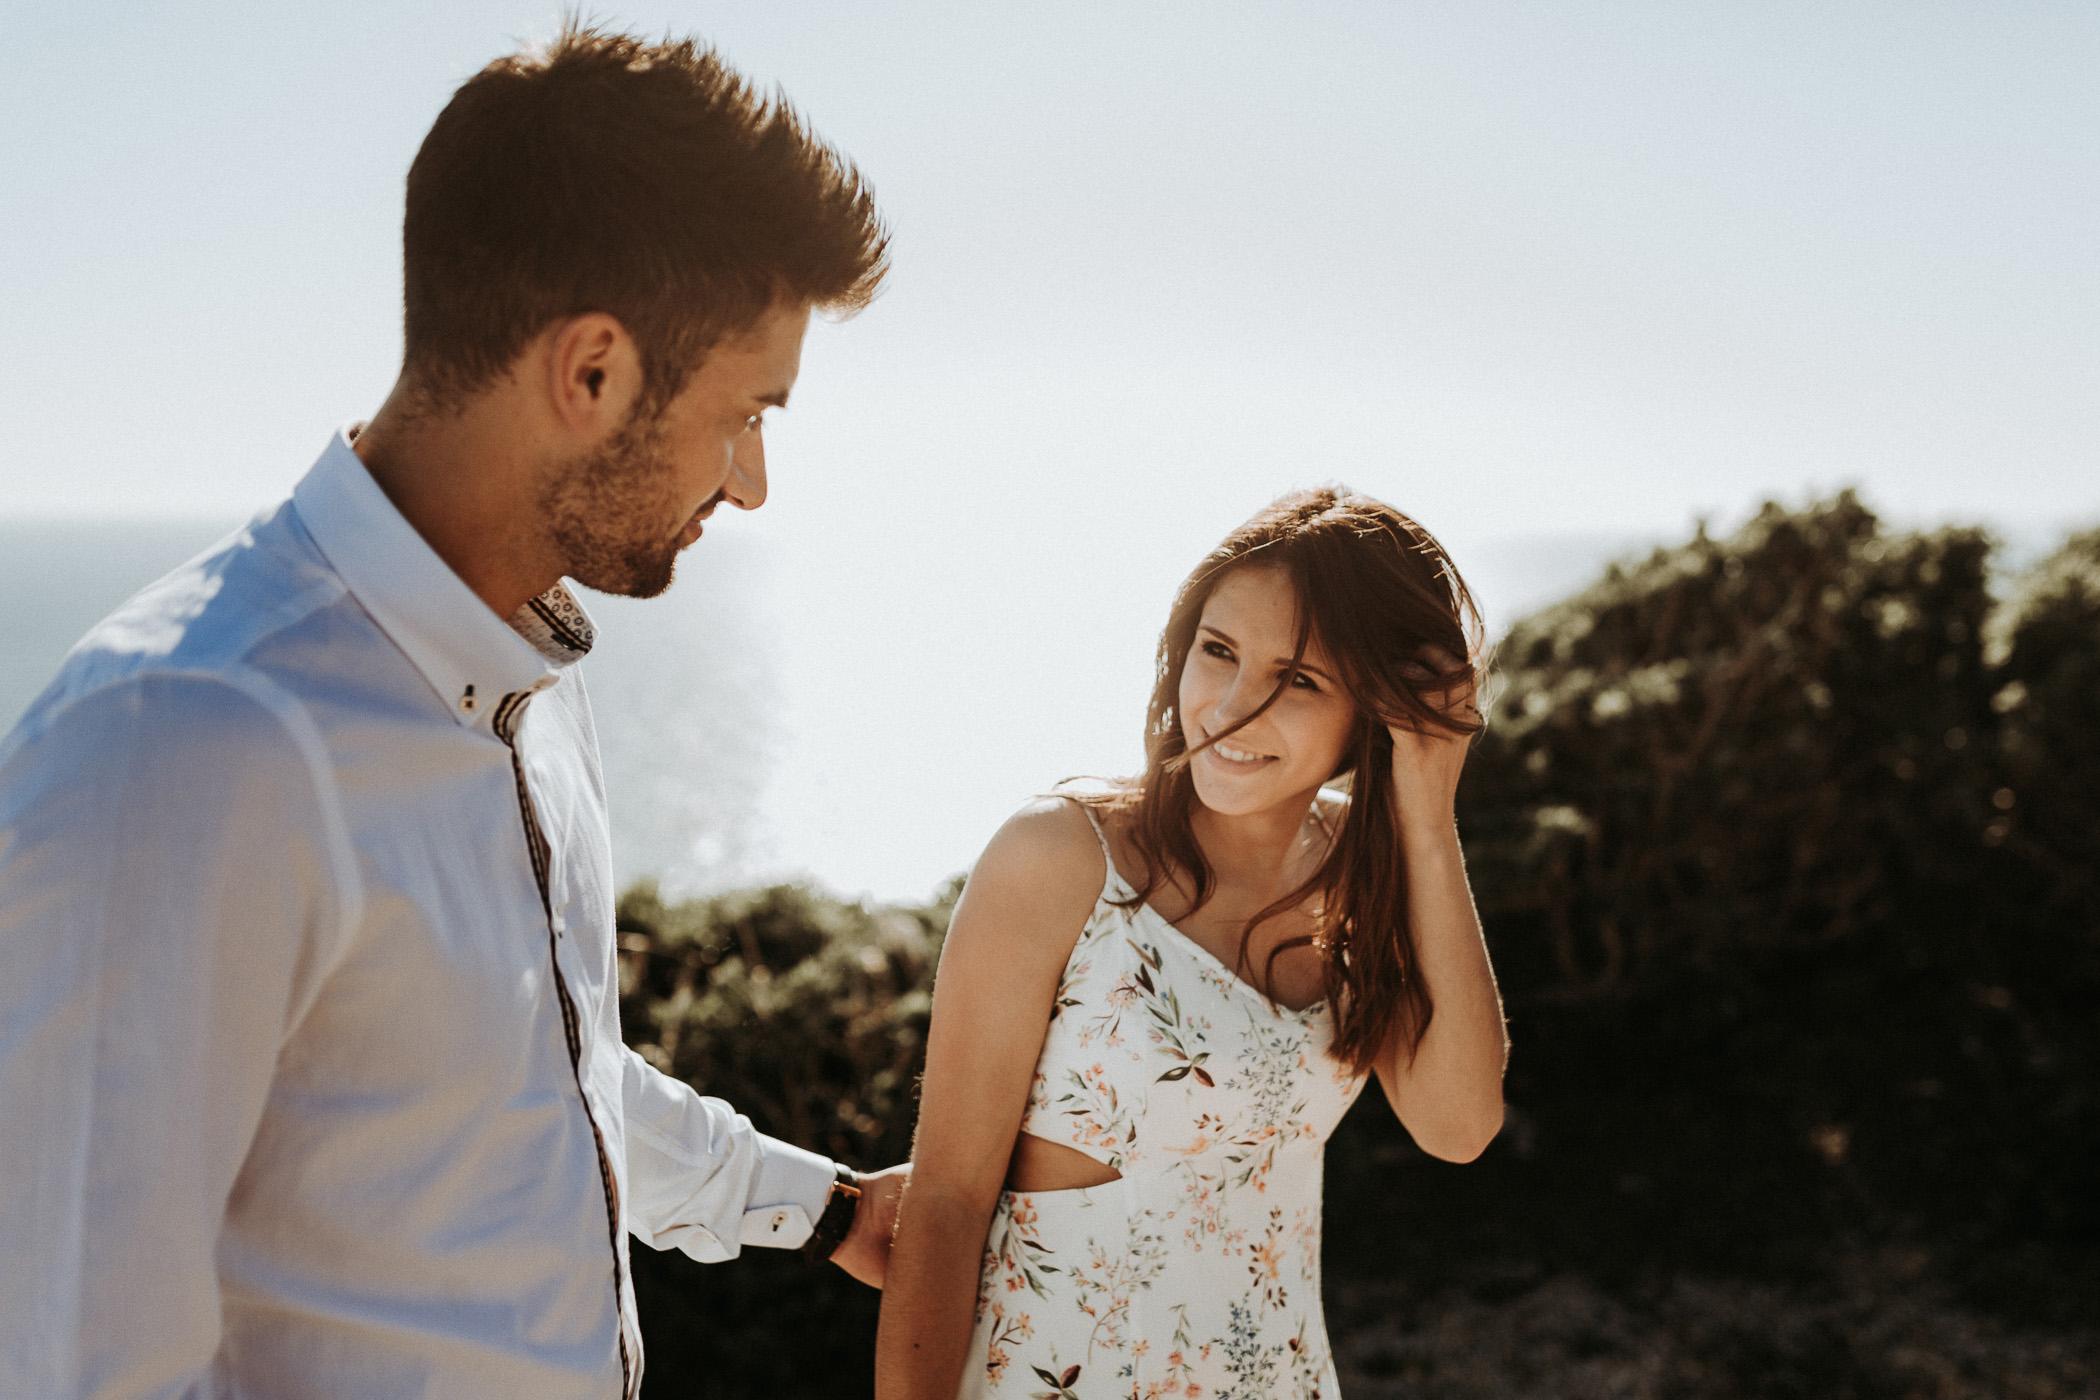 DanielaMarquardtPhotography_wedding_elopement_mallorca_spain_calapi_palma_lauraandtoni_32